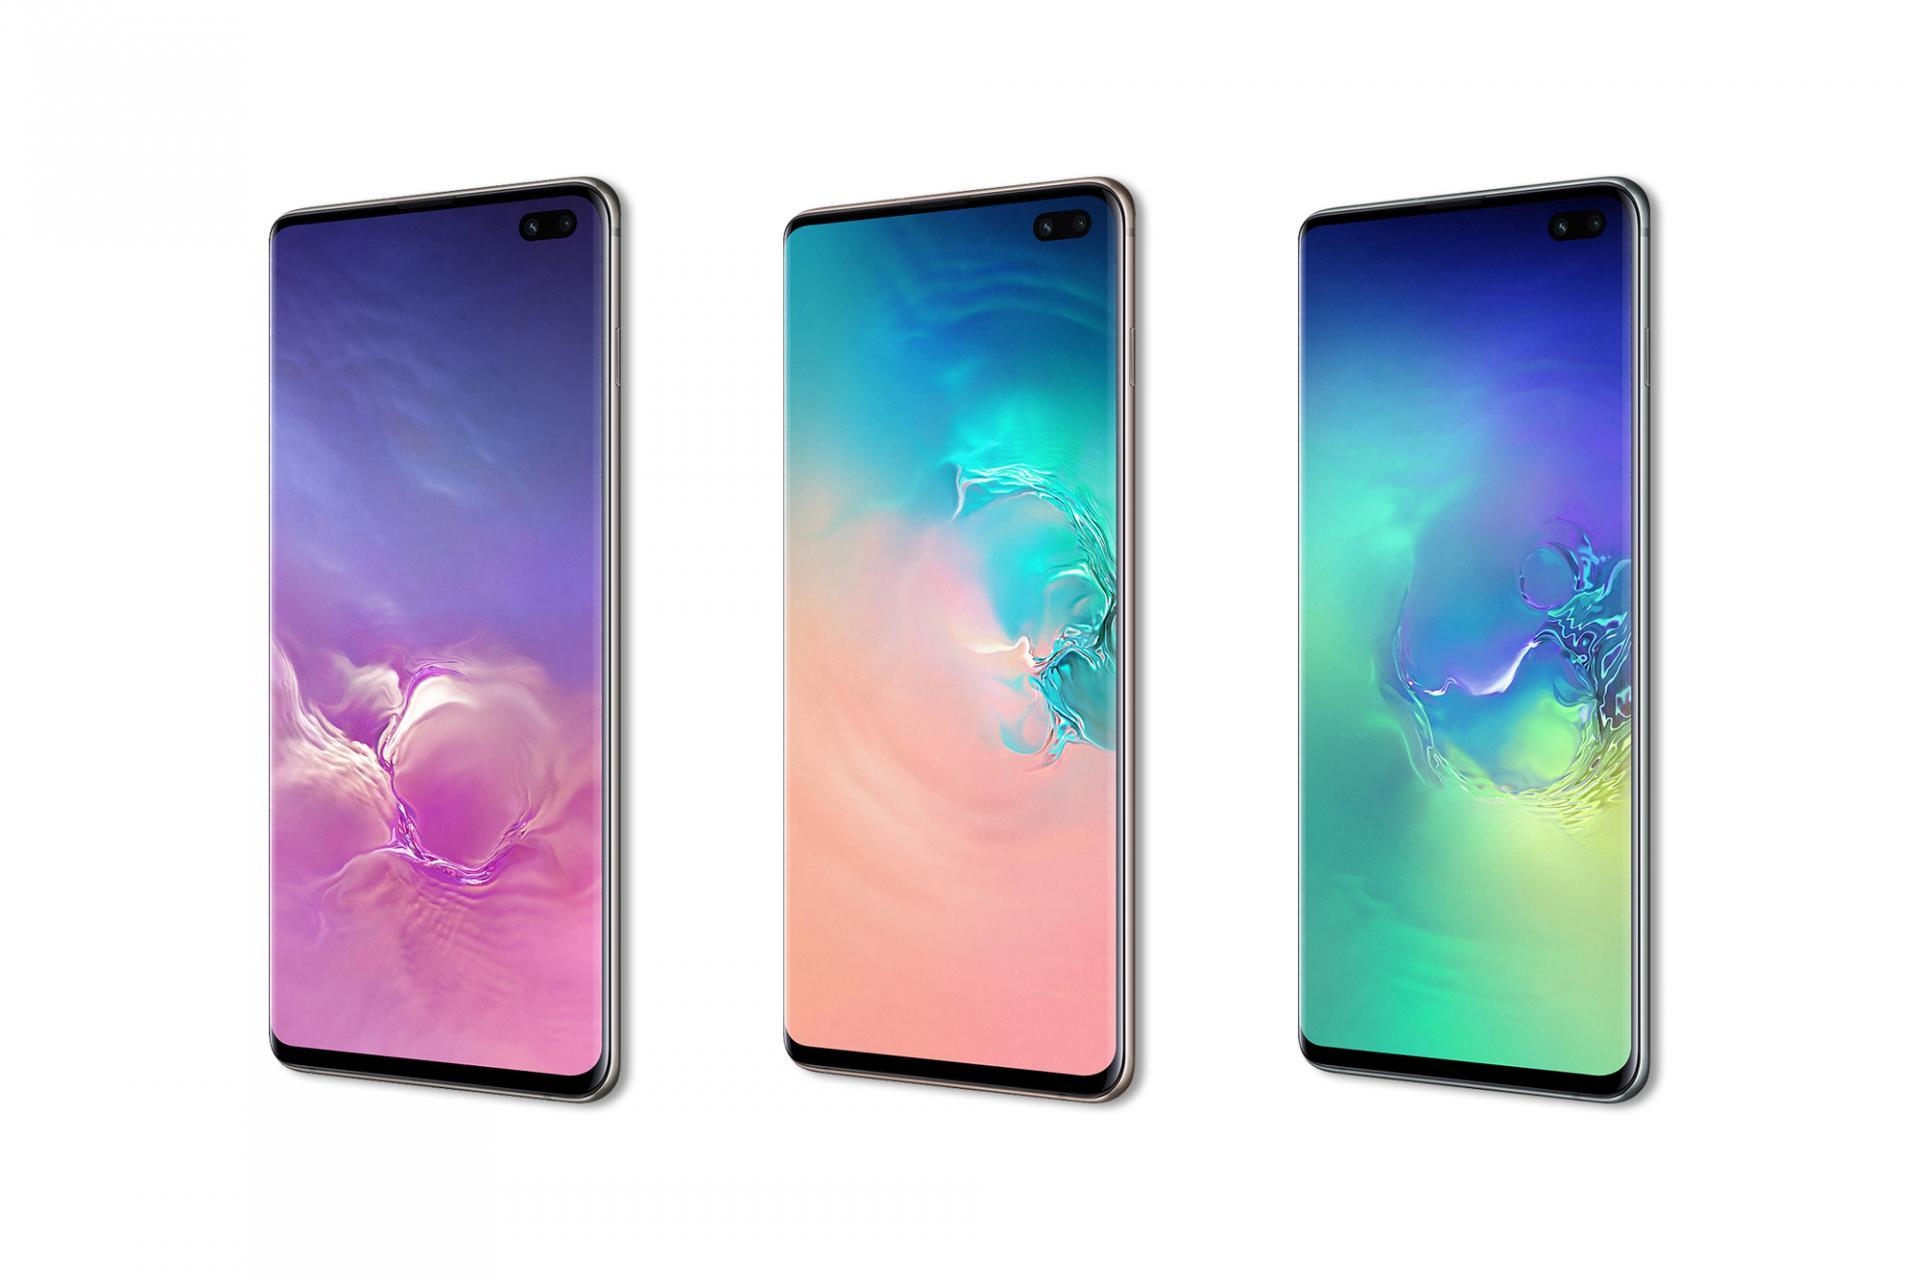 Samsung Galaxy S10. Смогли смартфон удивить?